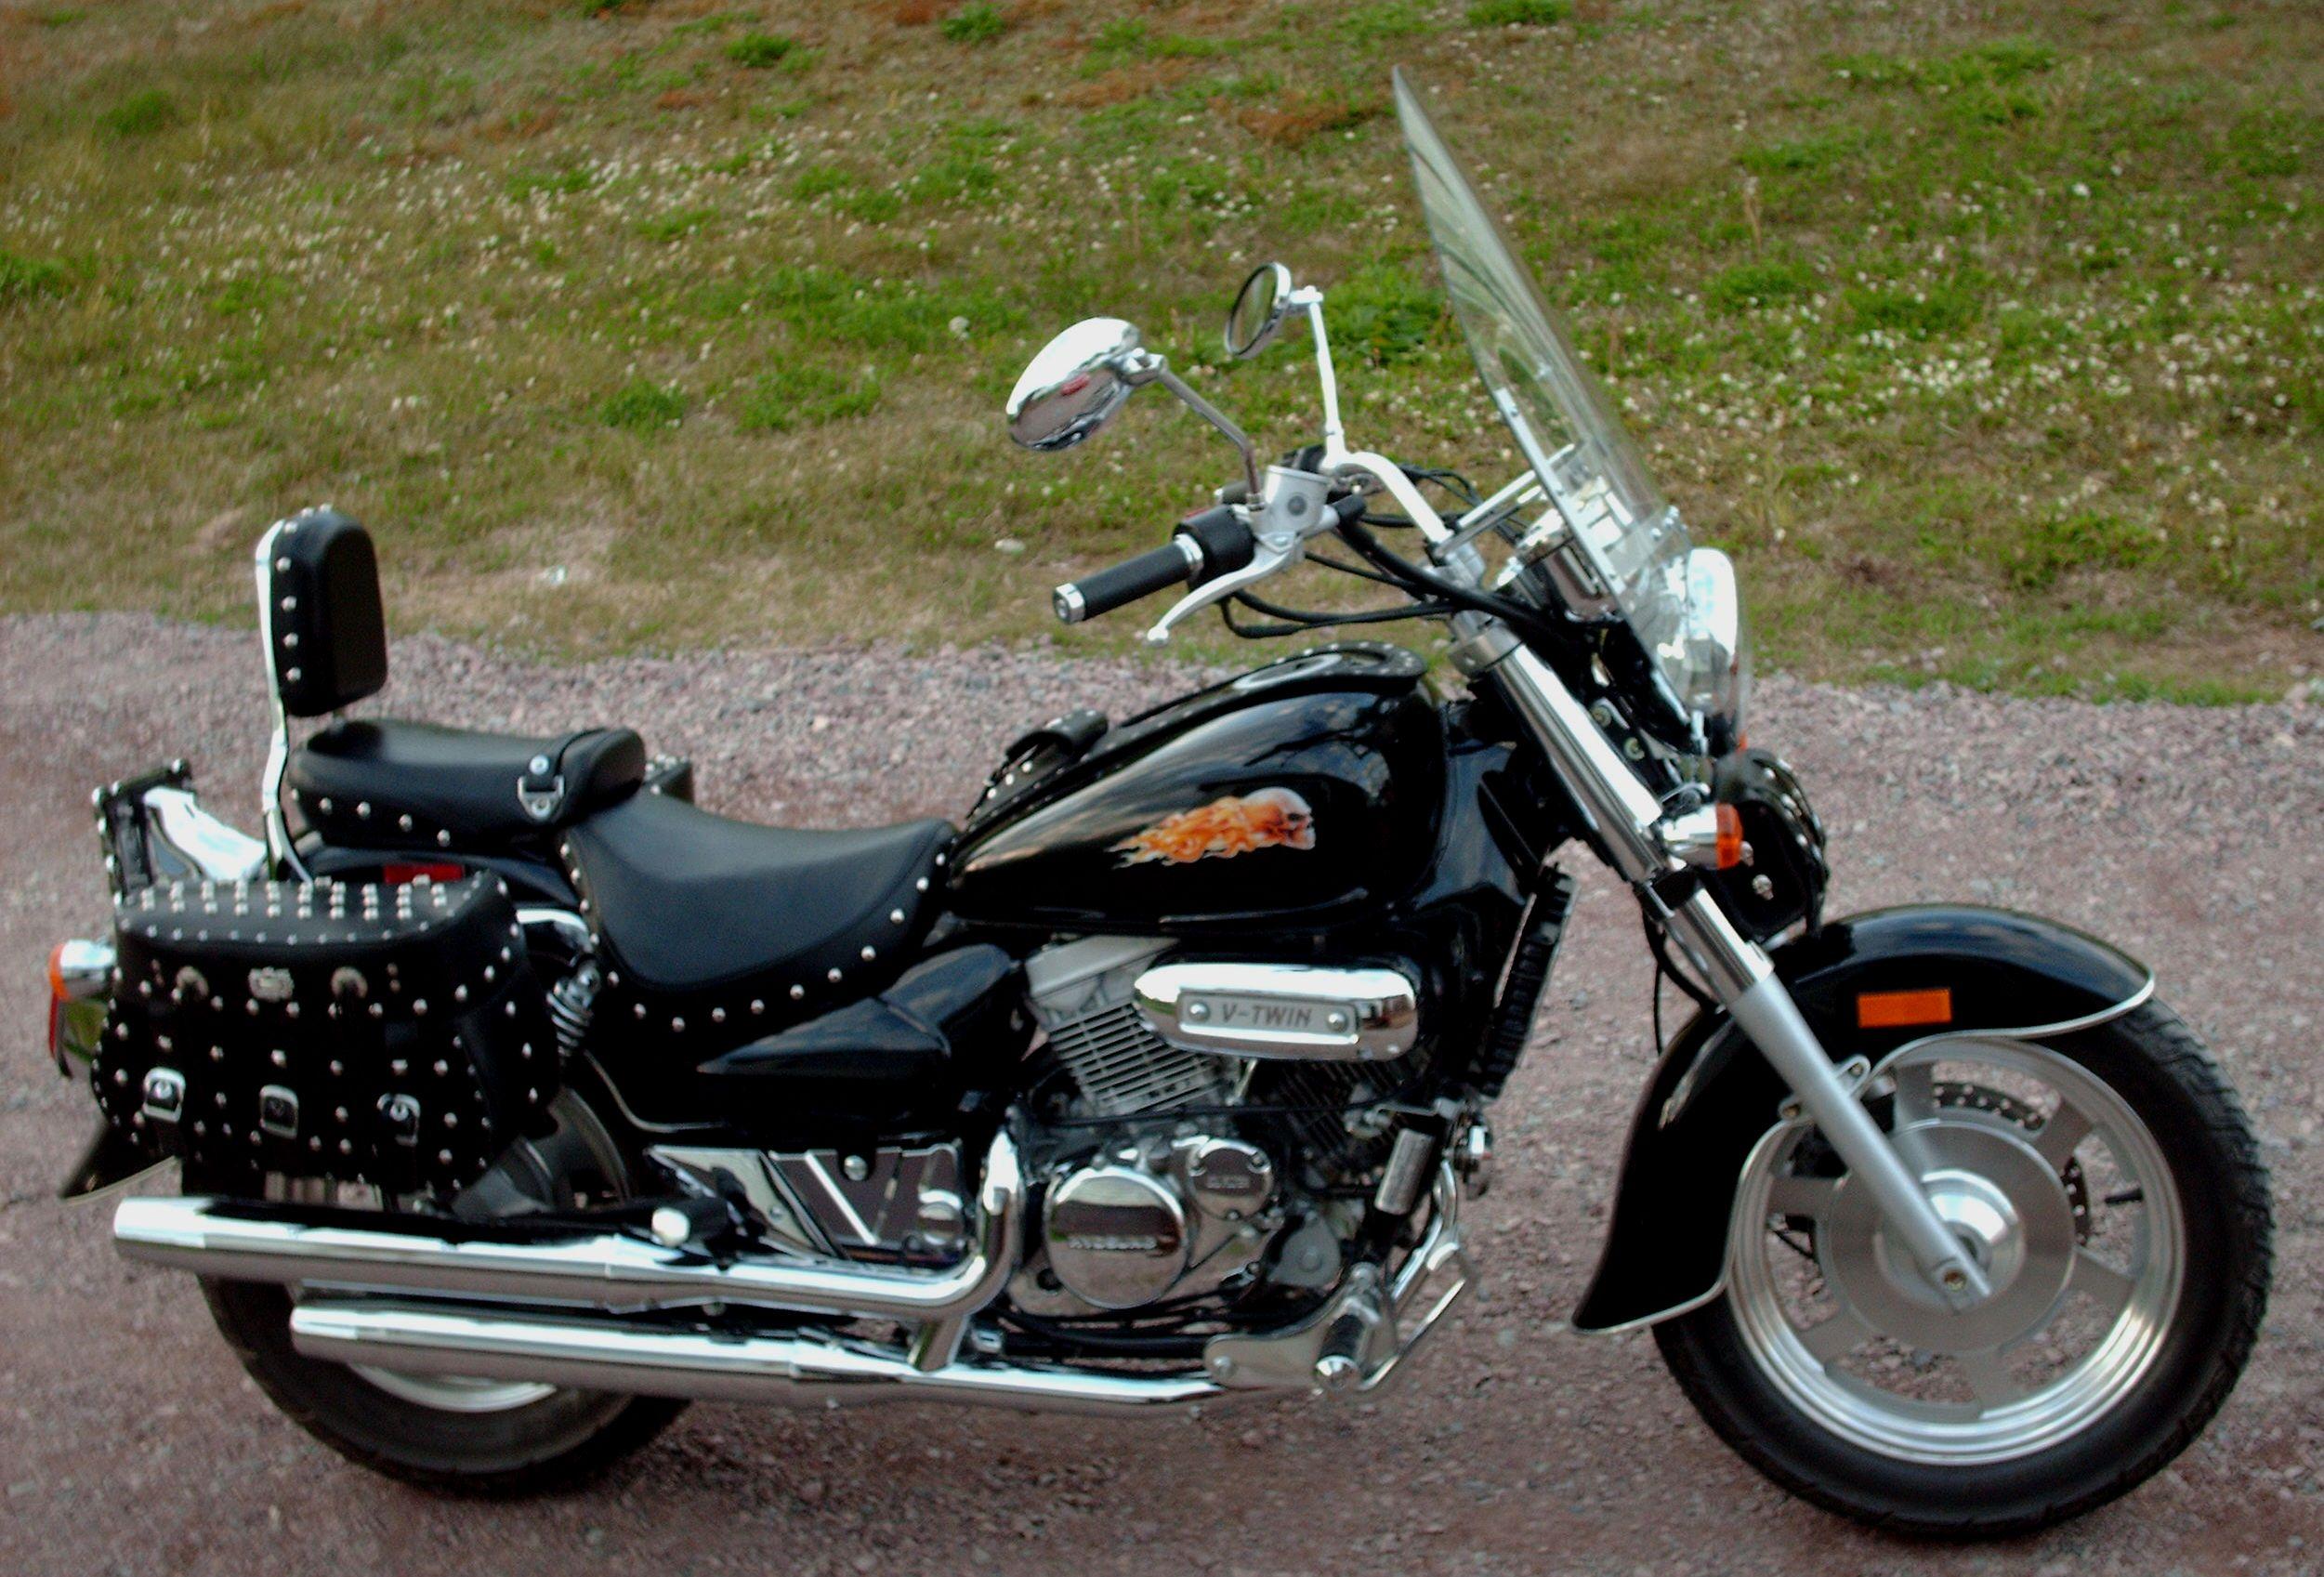 Where Harley Davidson Motorcycle Born